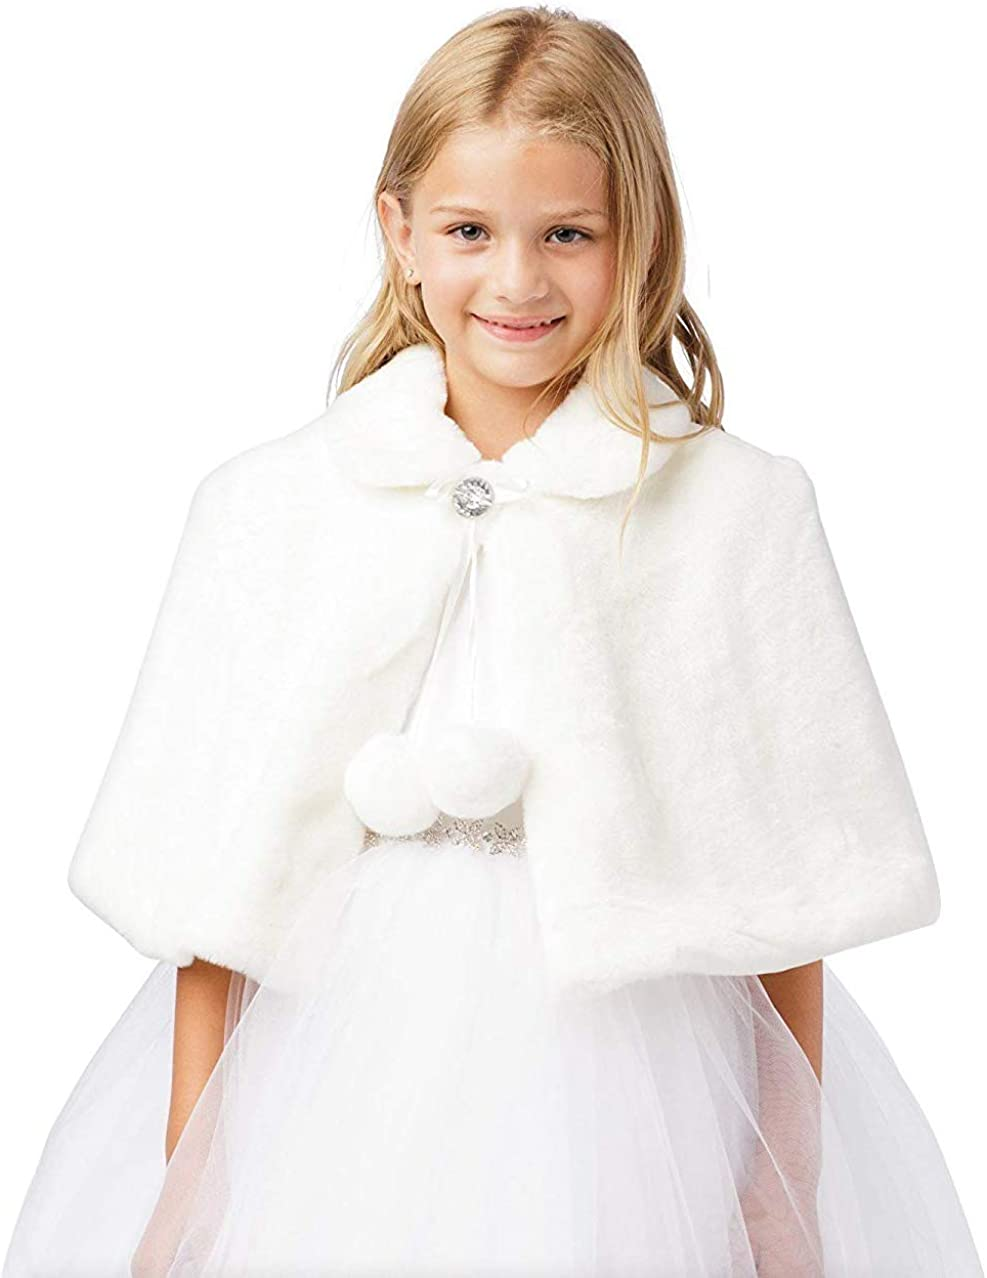 iGirlDress Girls Plush Fur Cape with Collar Flower Girl Bolero Jacket Shrug Coat